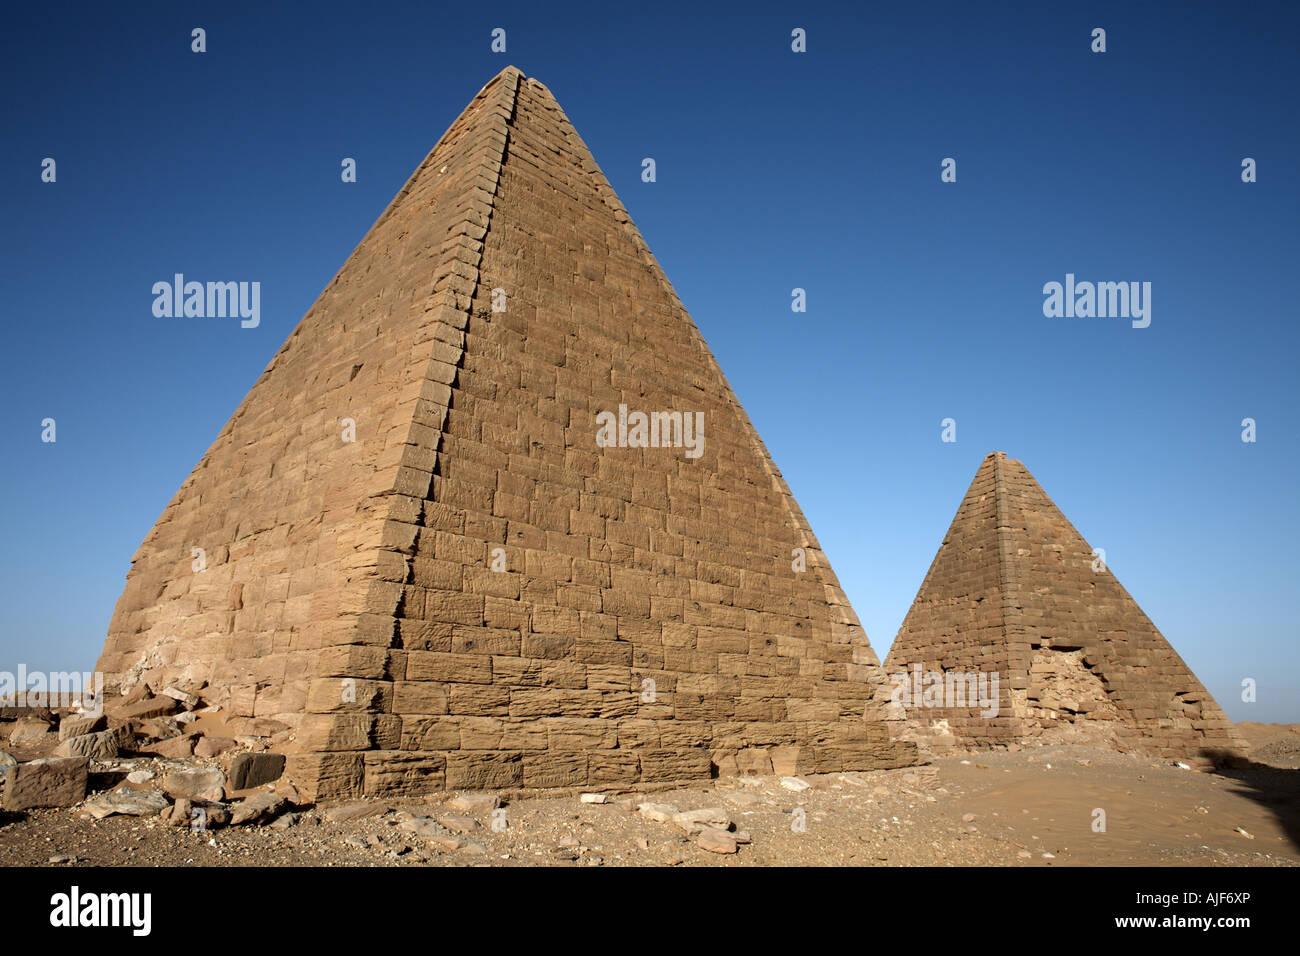 The pyramids at Jebel Barkal - Stock Image